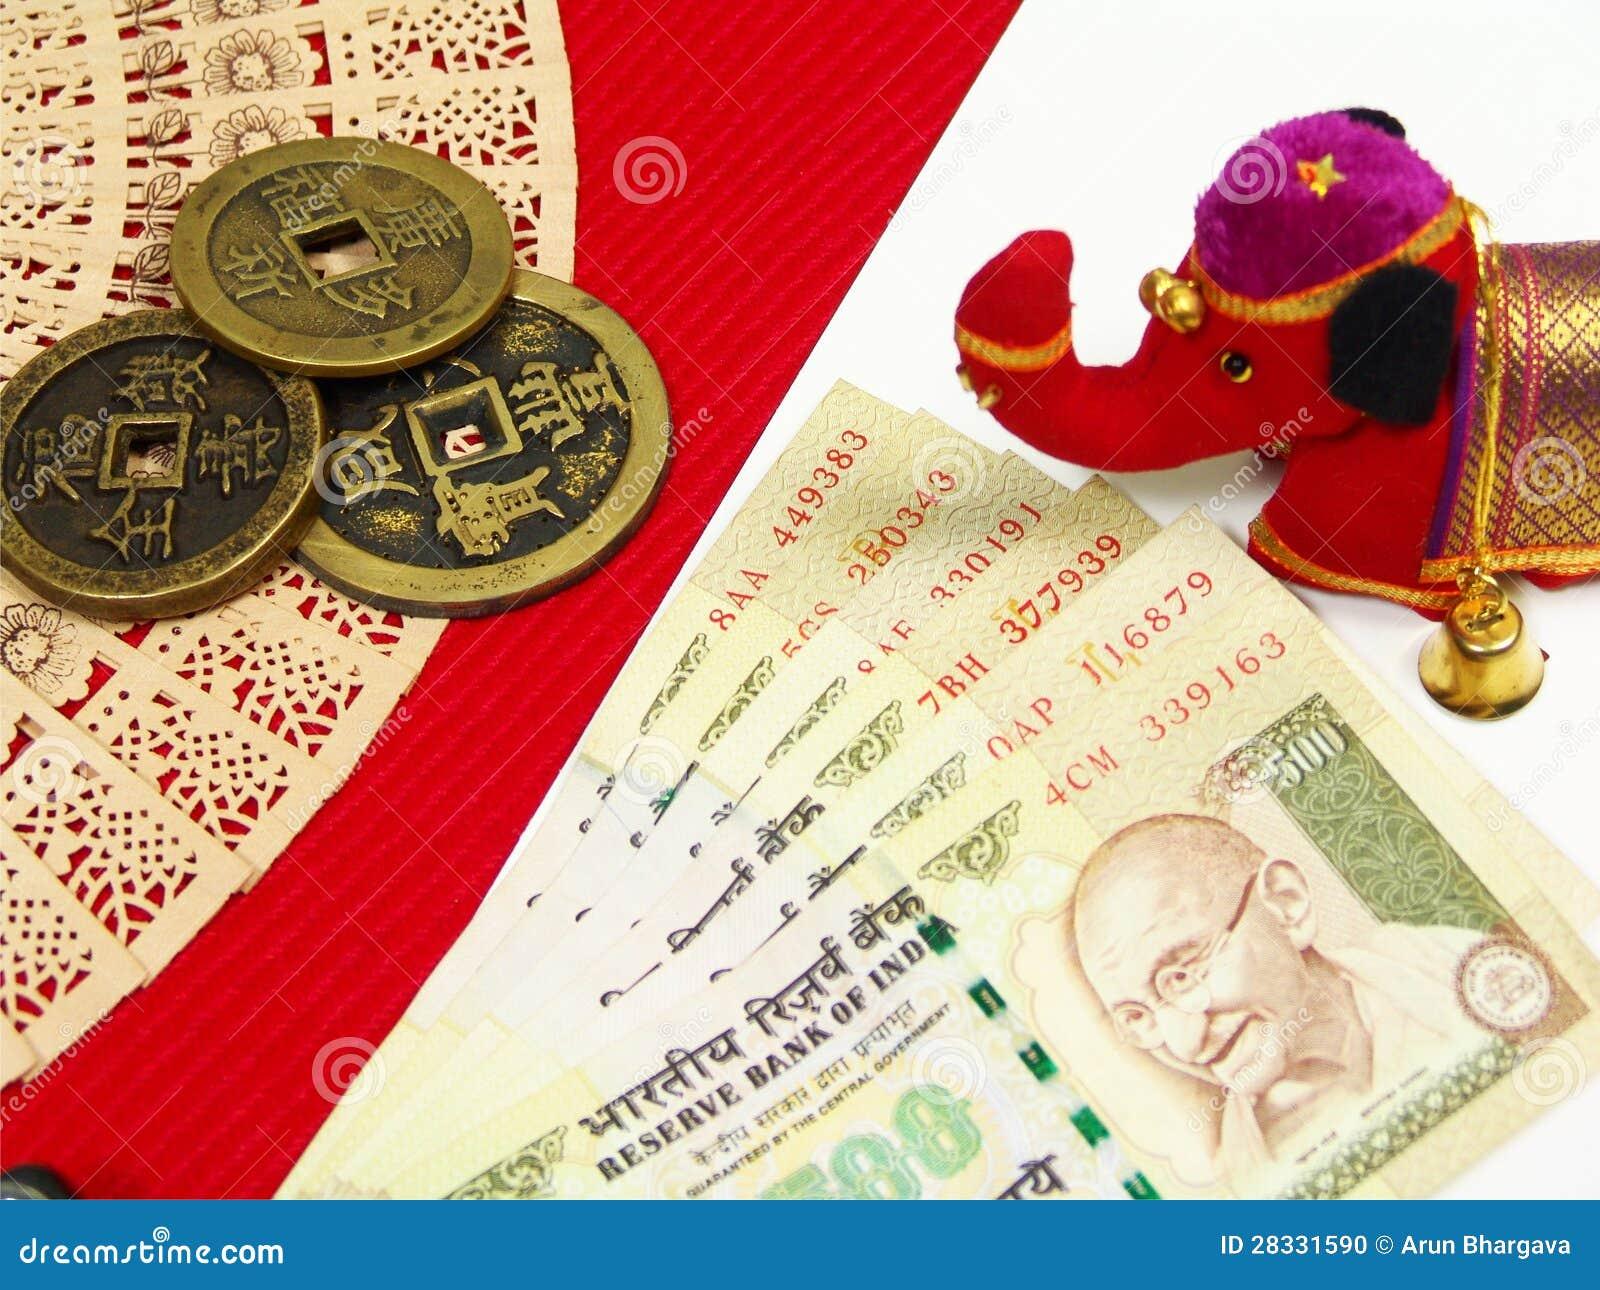 India anc Chiny pieniądze